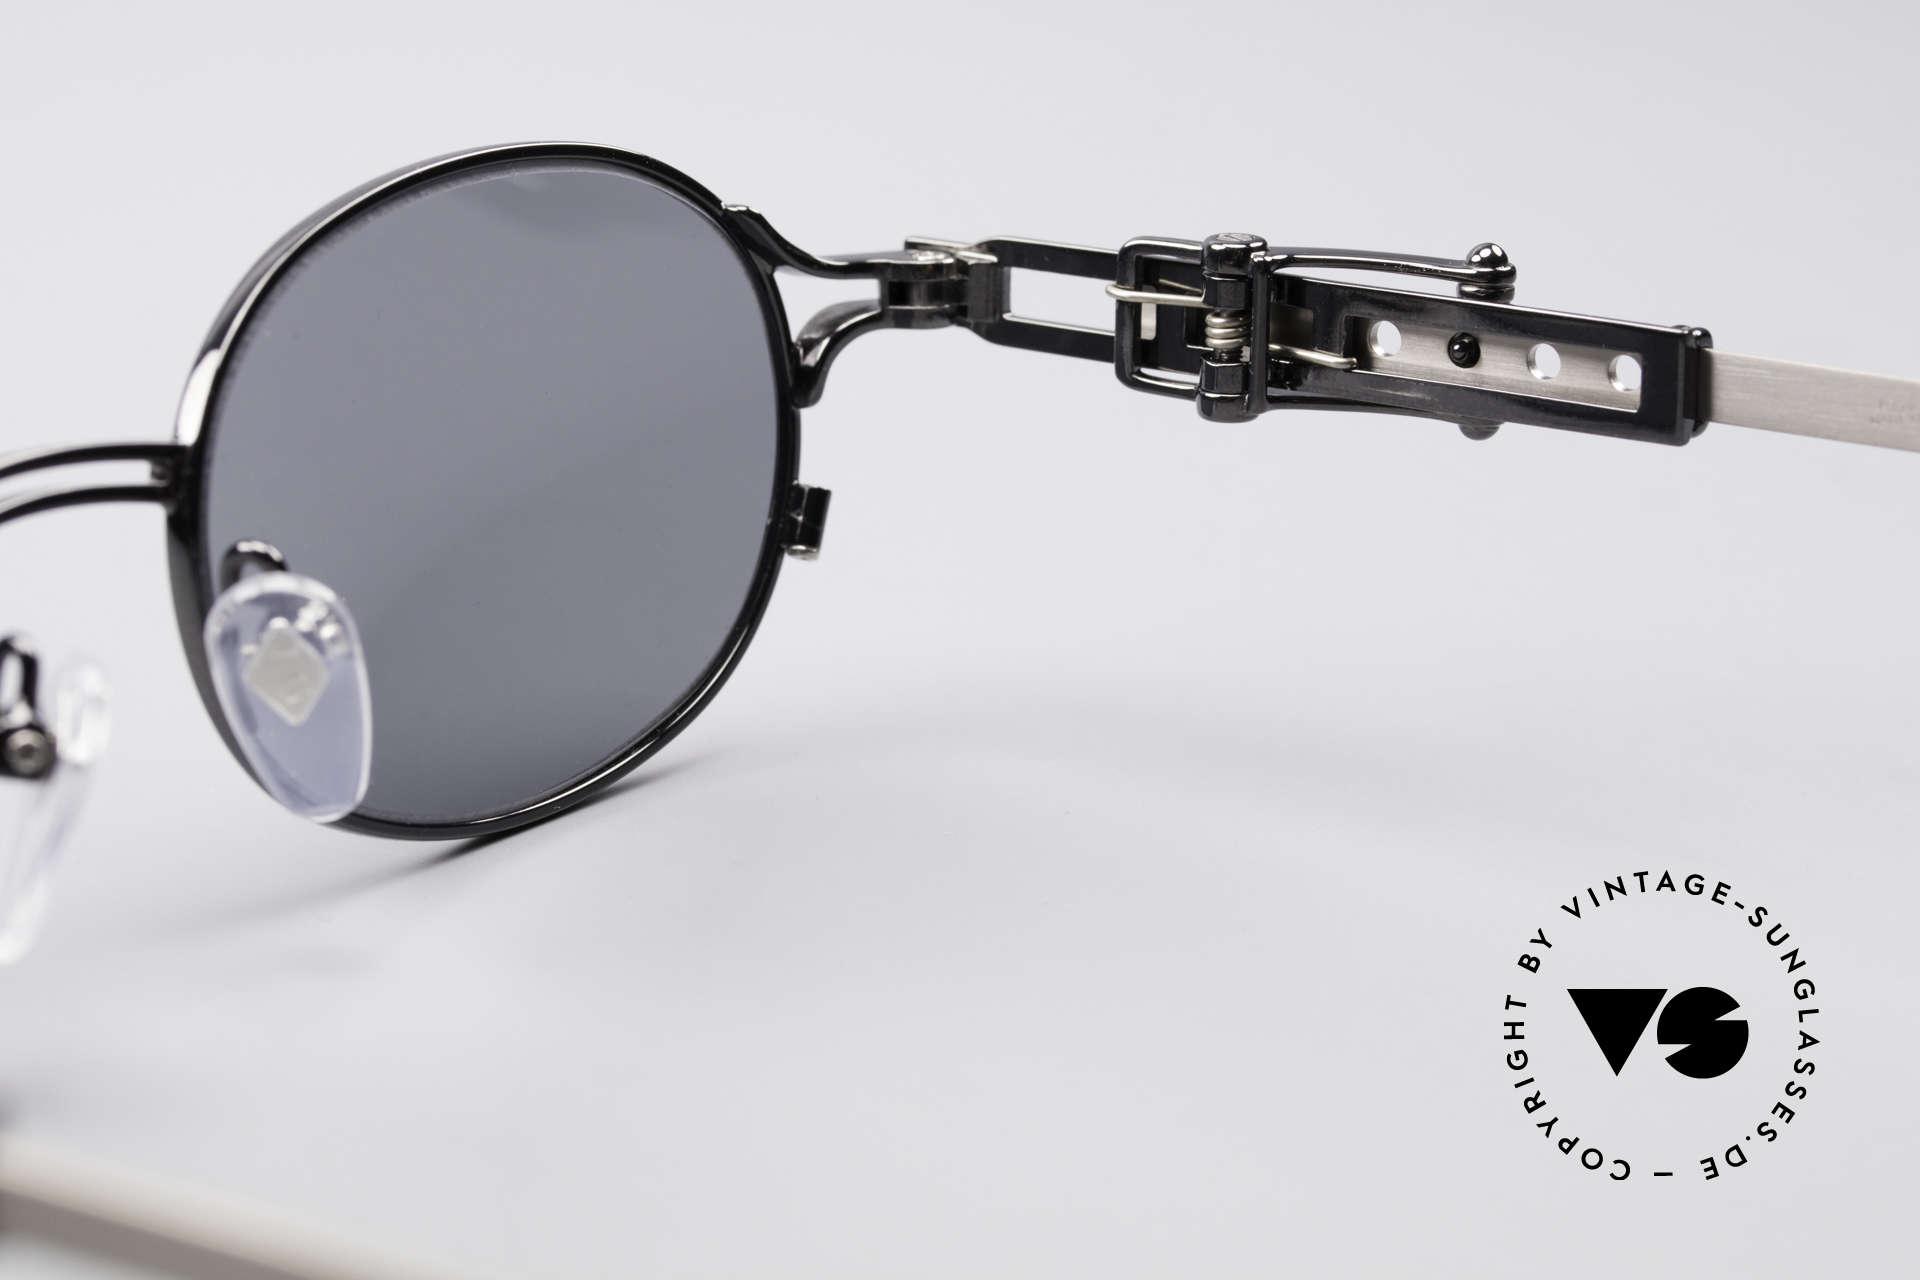 Jean Paul Gaultier 56-0020 Oval Belt Buckle Frame, Size: medium, Made for Men